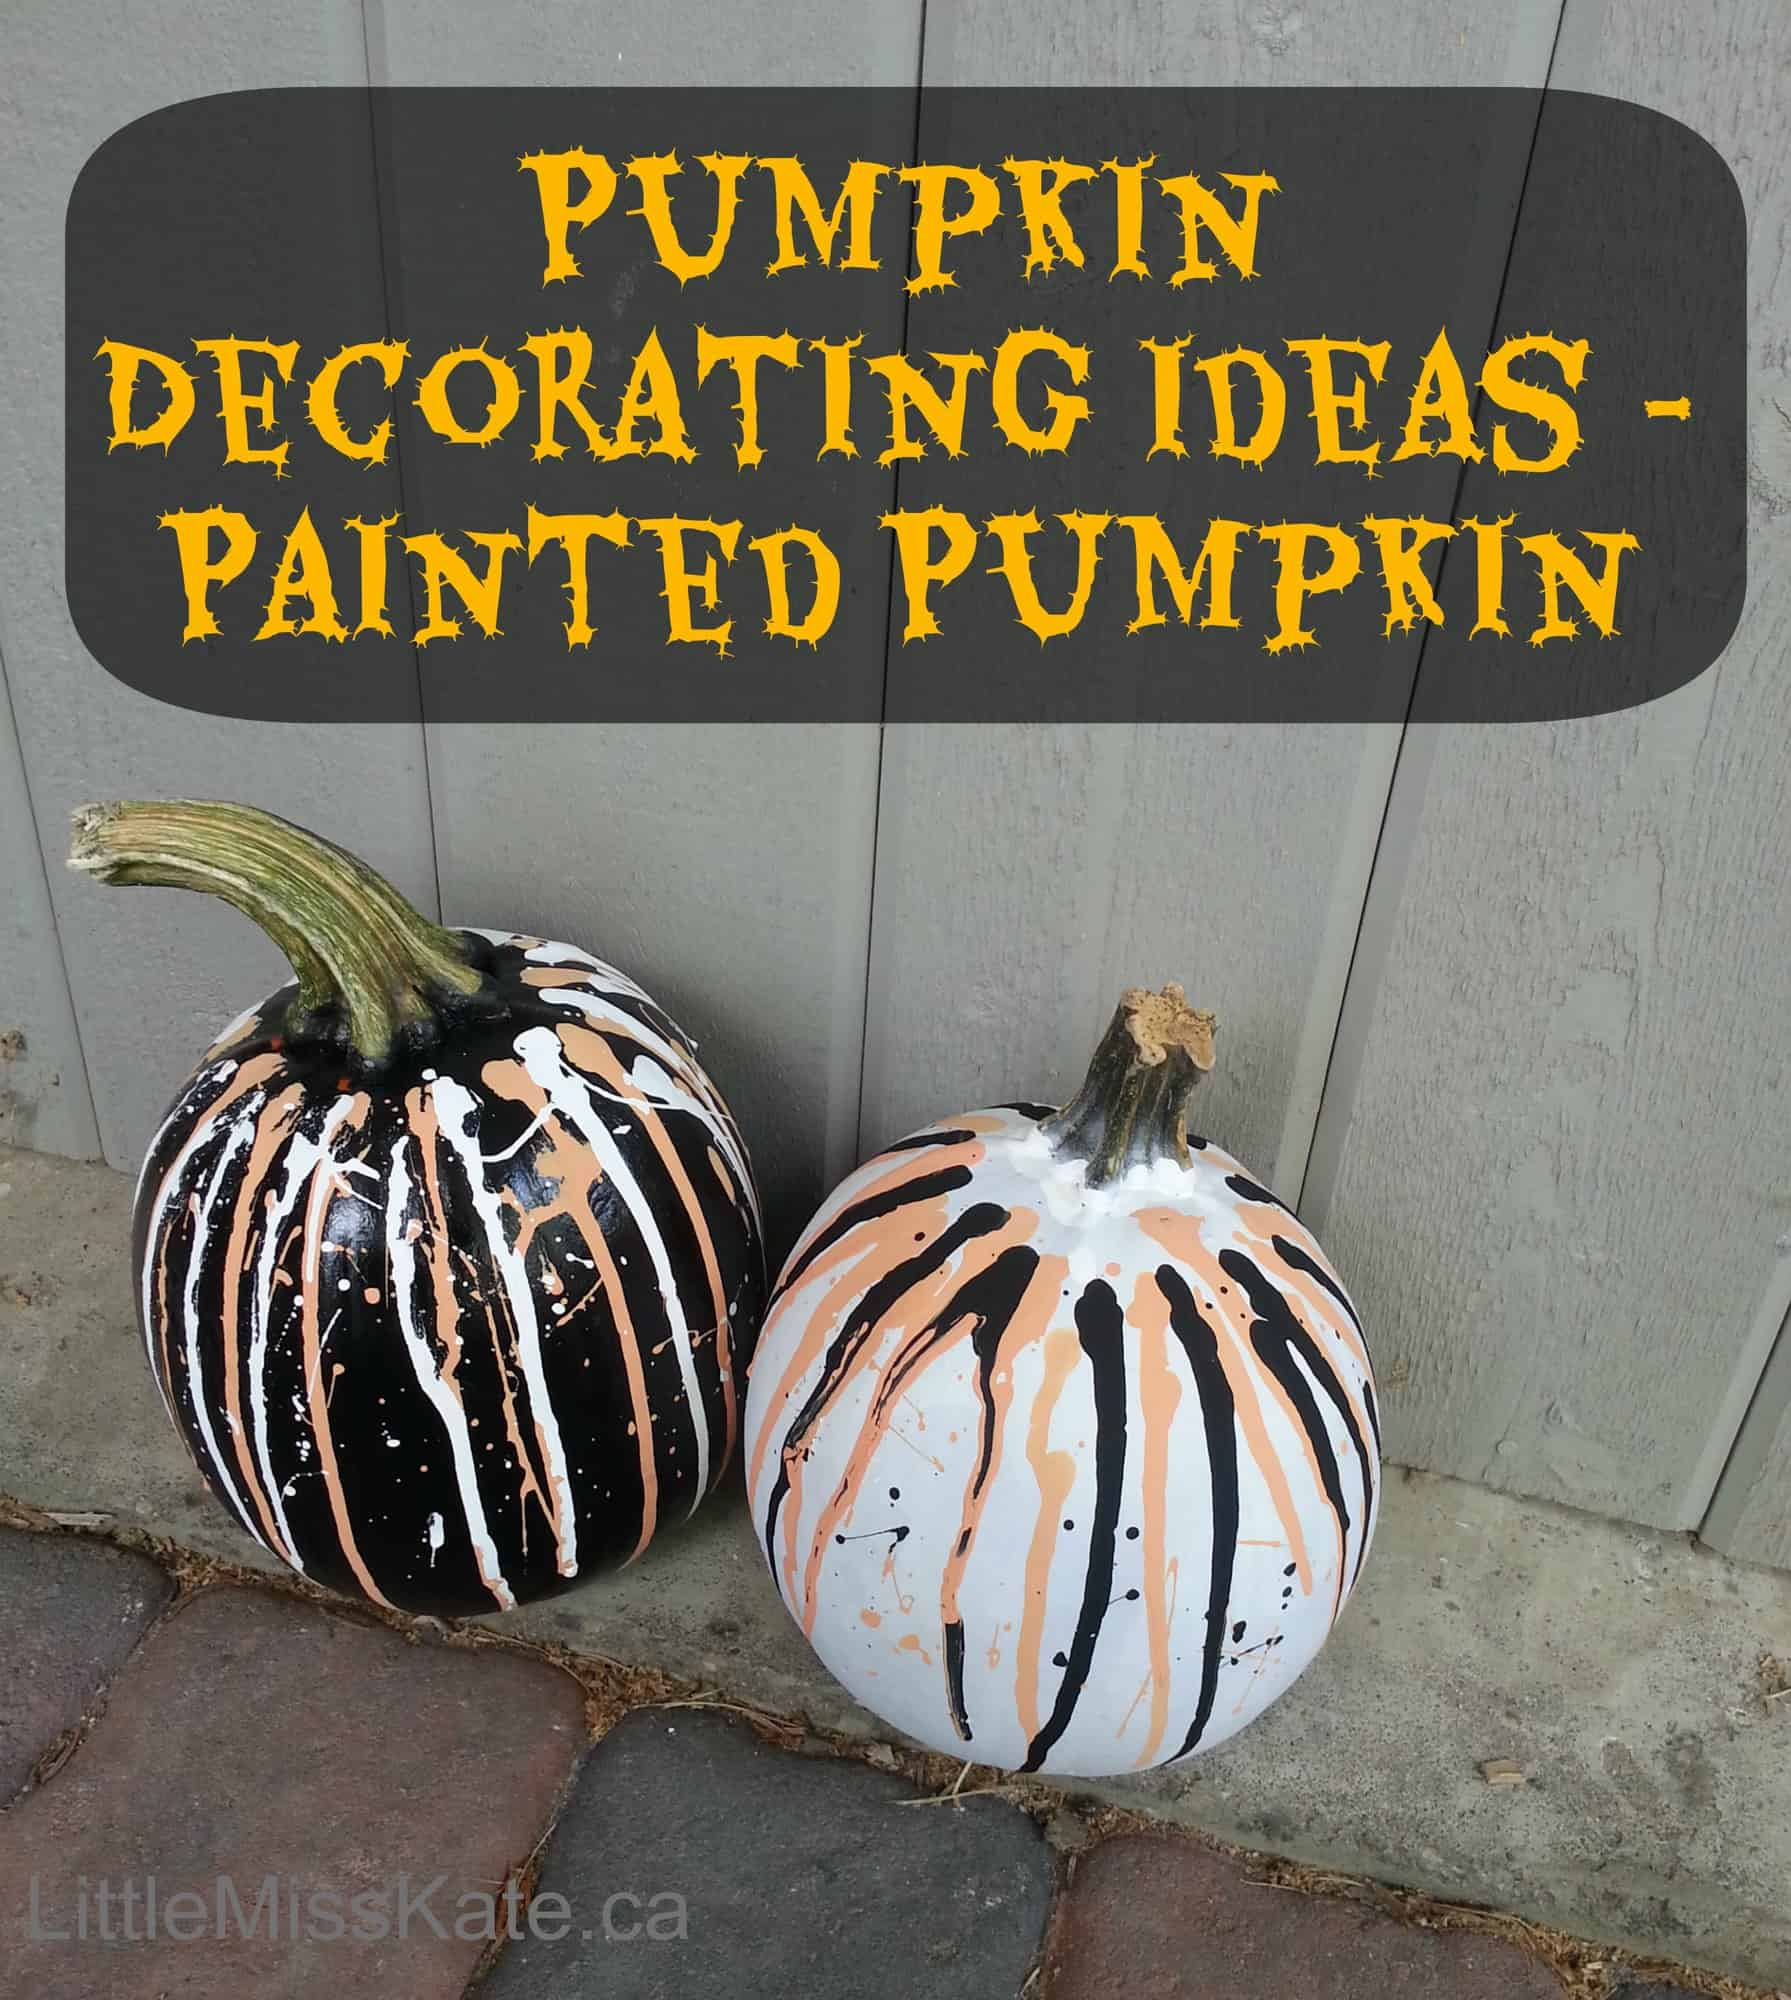 Pumpkin Decorating Ideas – Painted Pumpkins